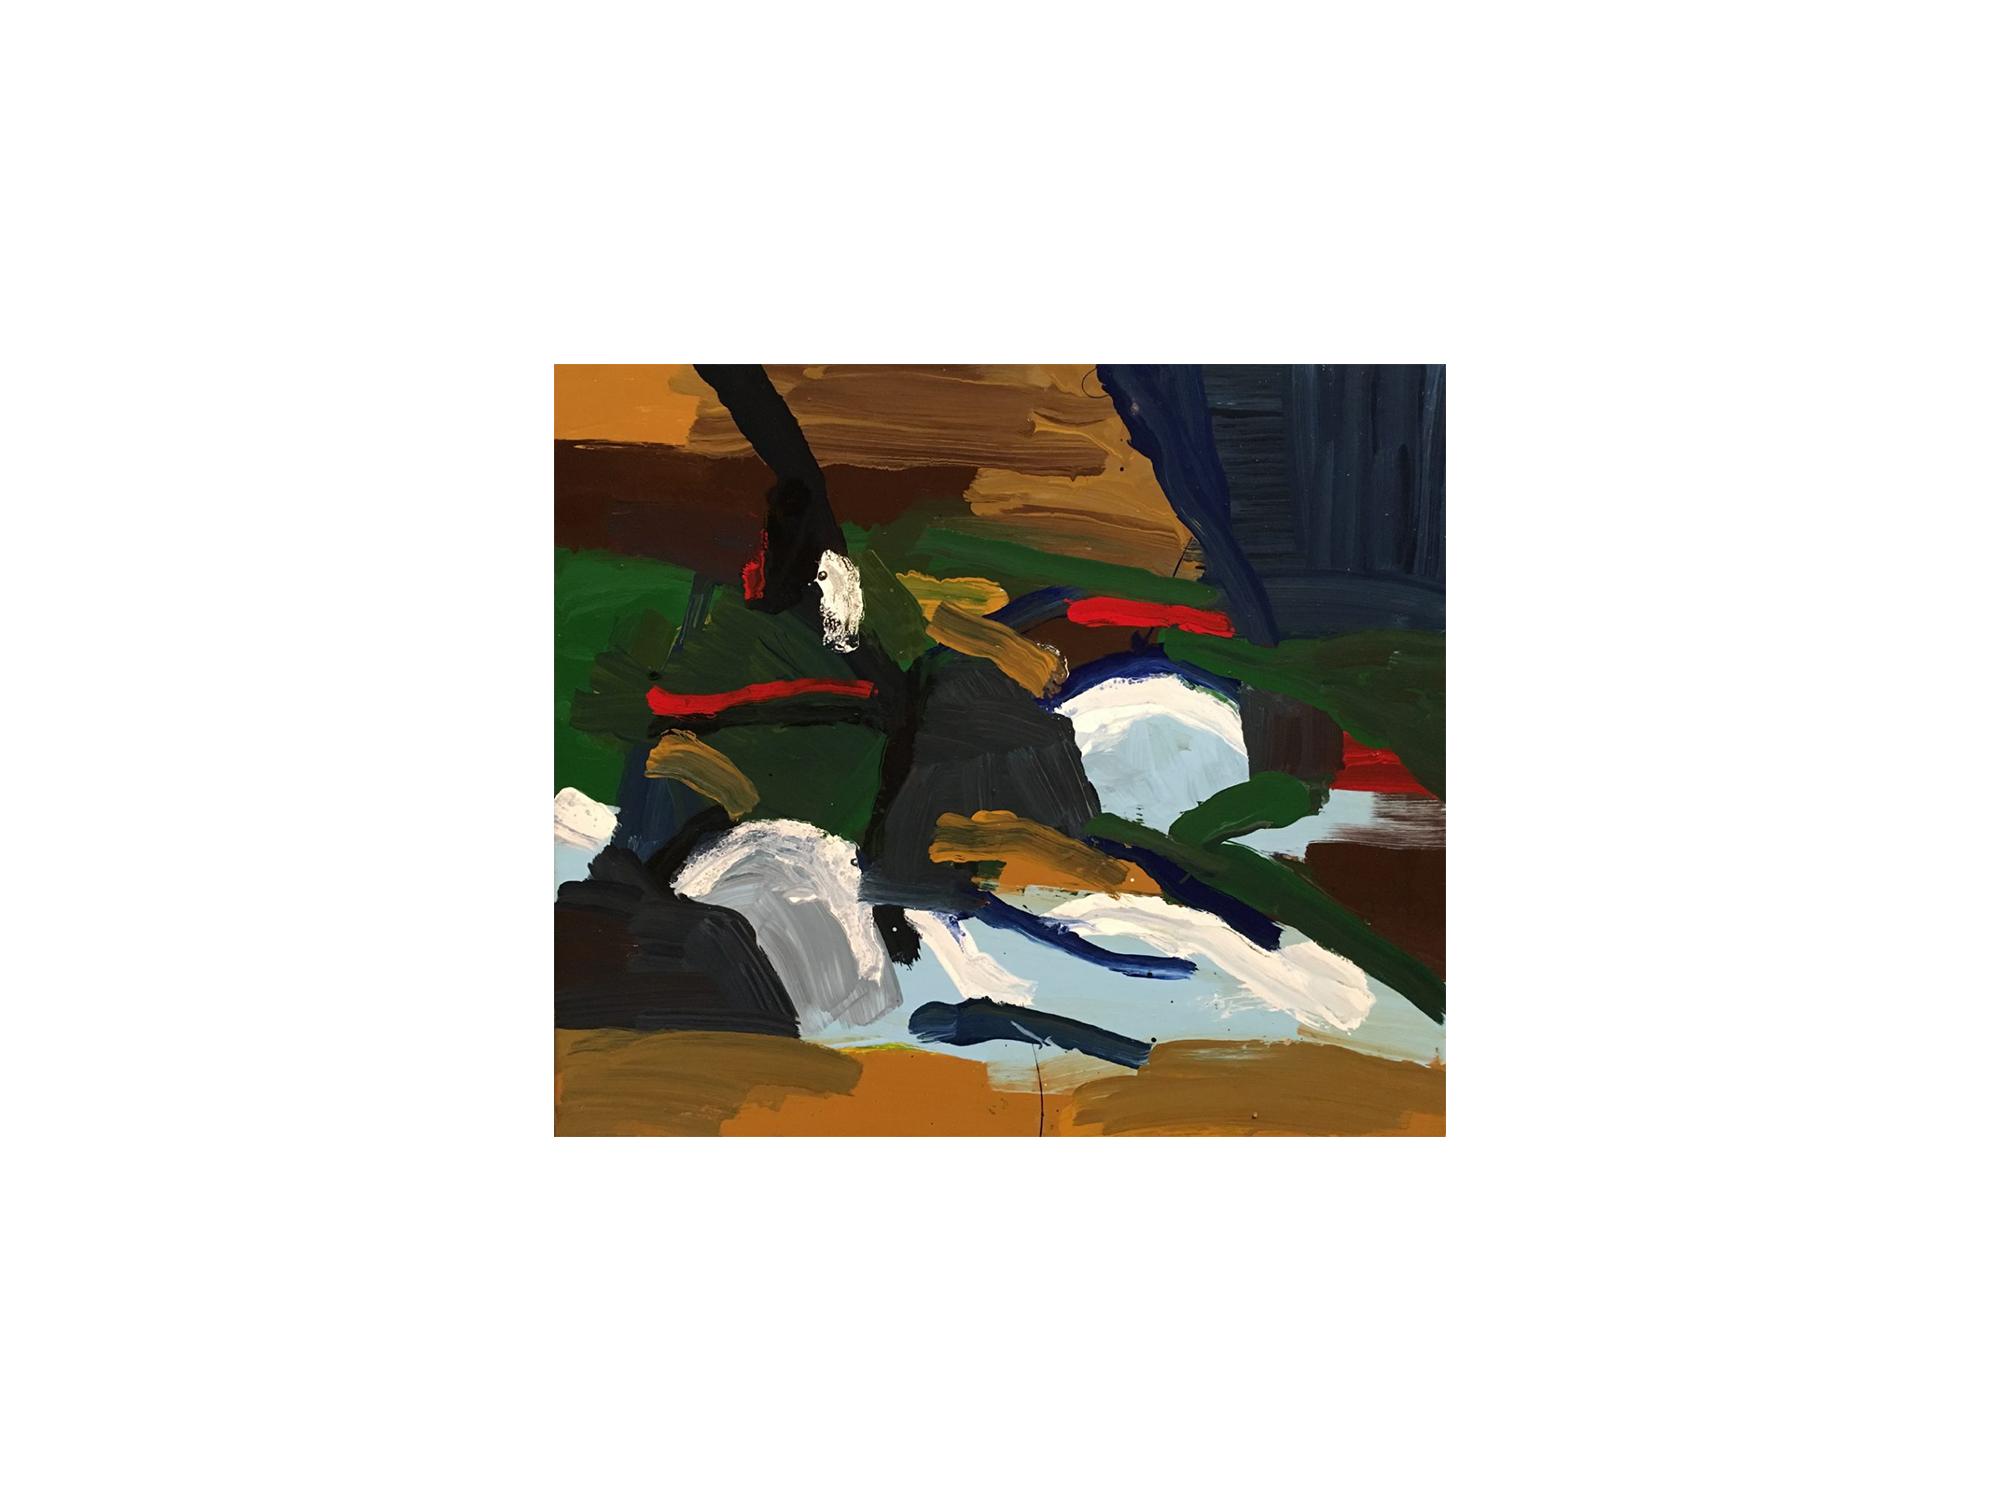 James Clayden   Reclining figures , 2015 enamel on canvas 41 x 61cm   ARTIST BIO